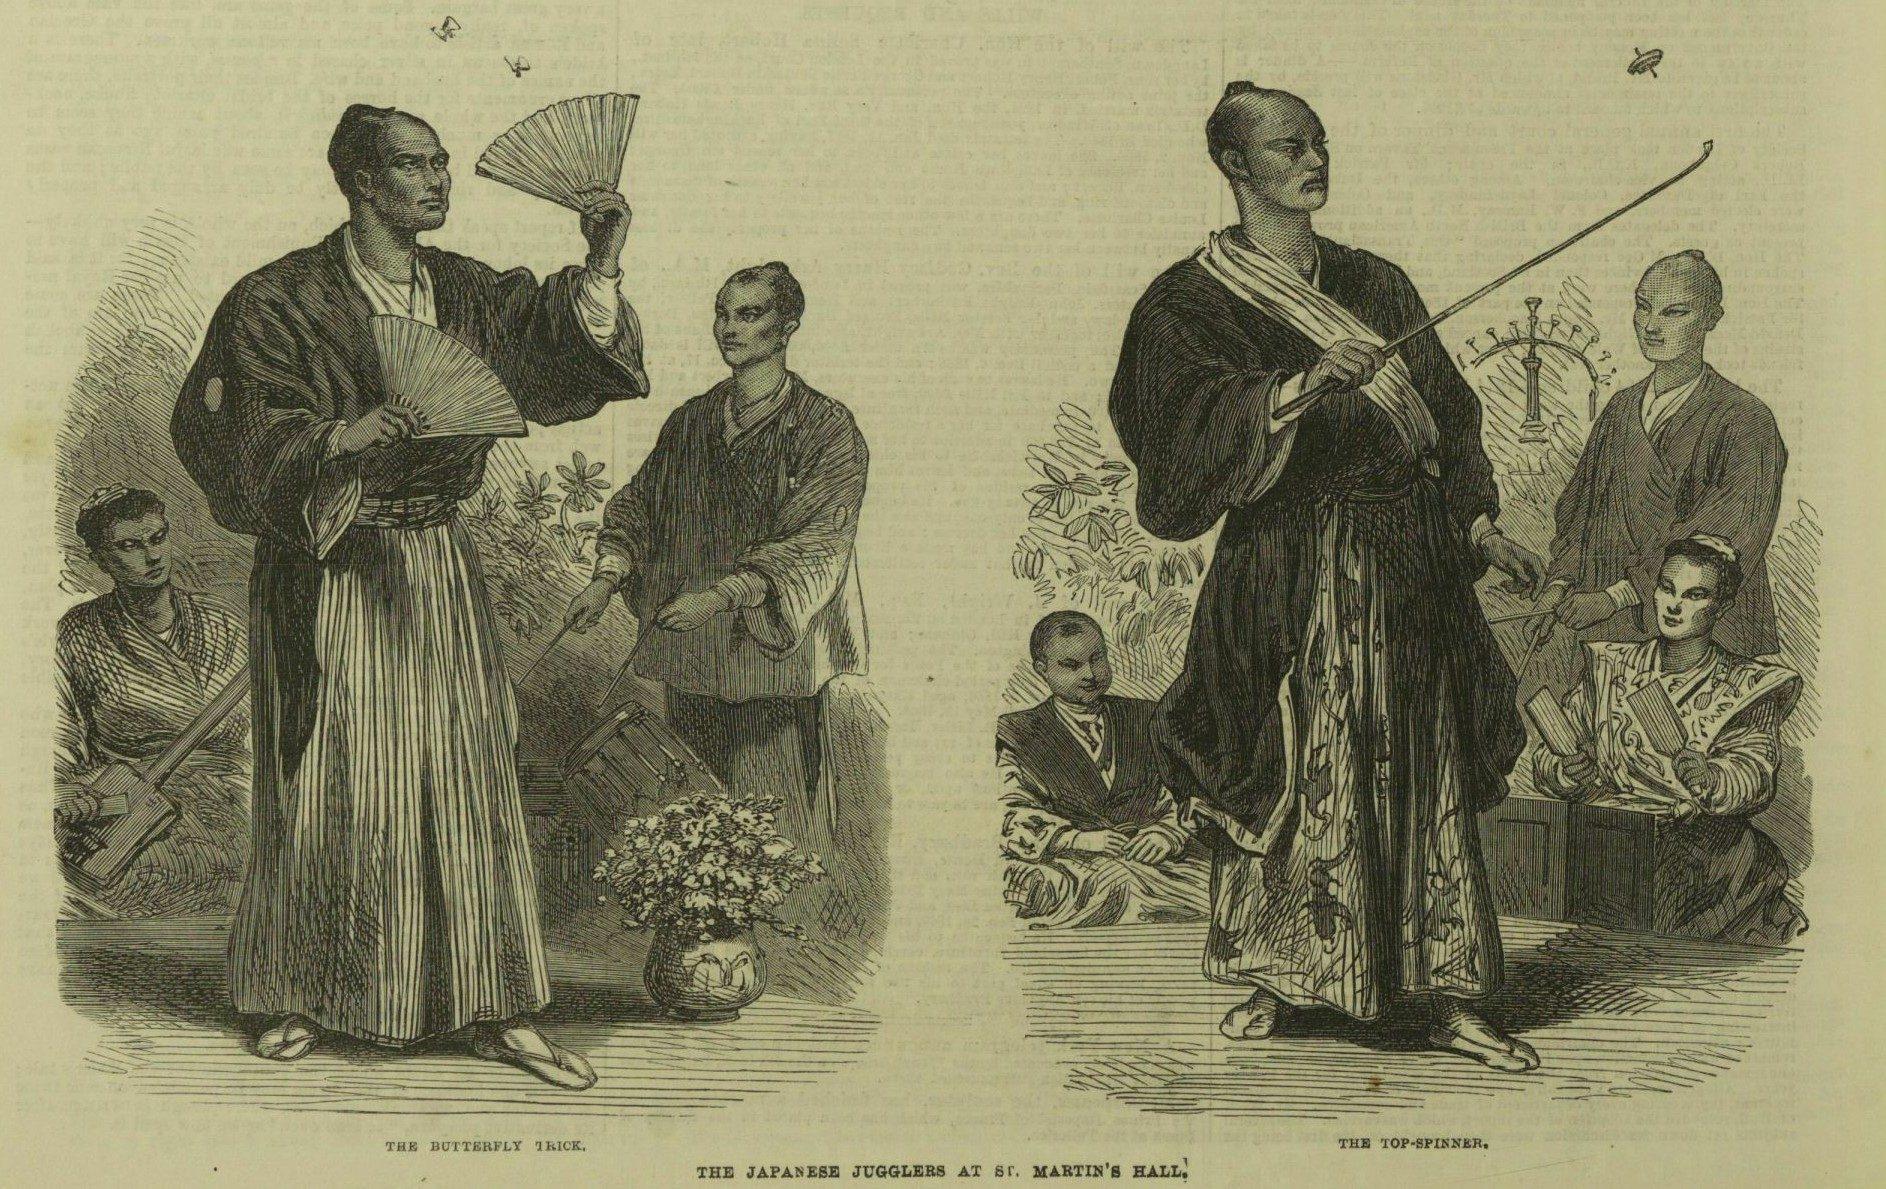 """The Japanese Jugglers."" Illustrated London News, 23 Feb. 1867, p. 176. The Illustrated London News Historical Archive, 1842-2003"